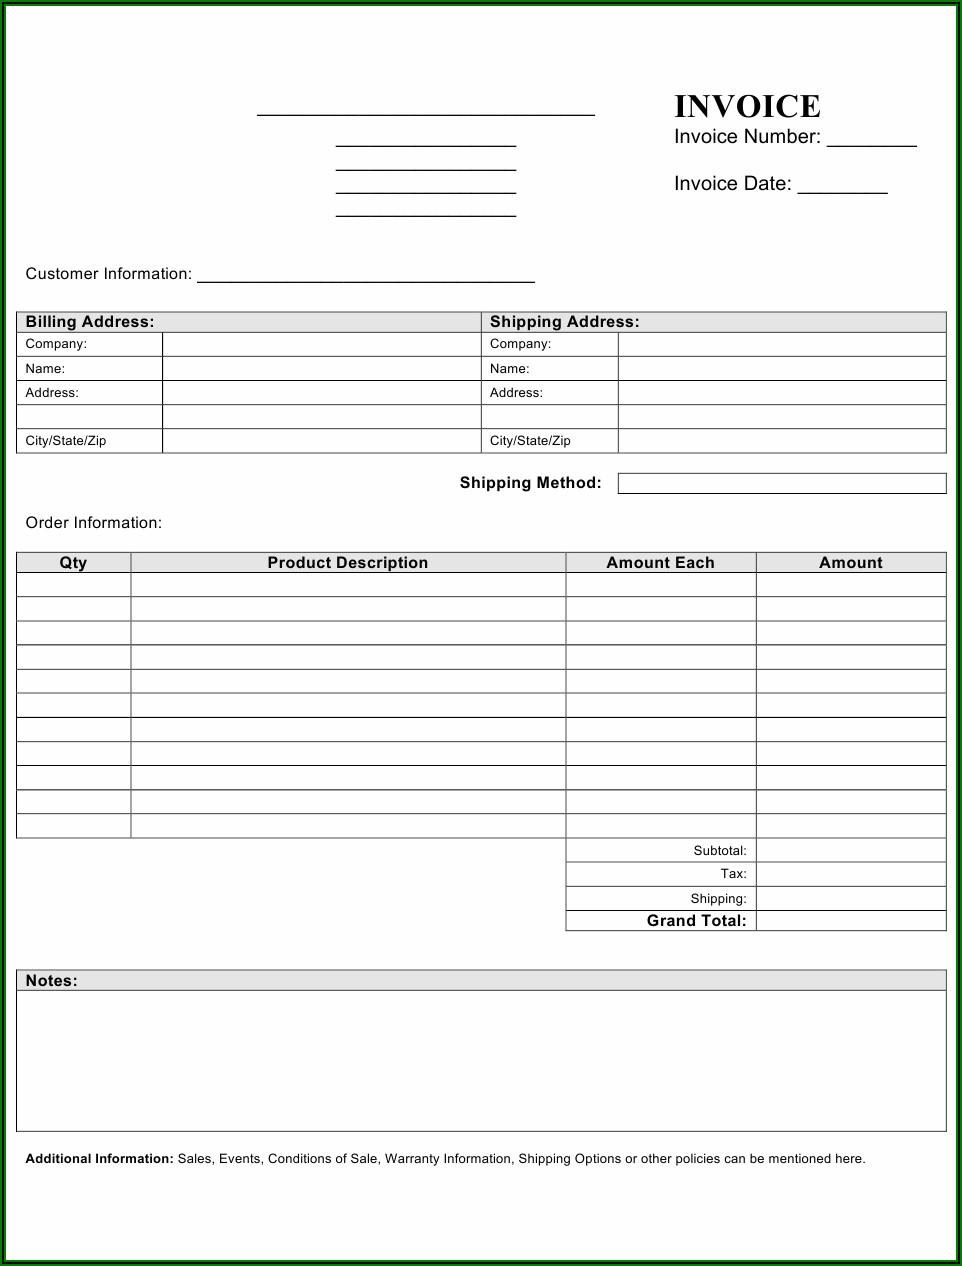 Blank Invoice Fillable Pdf